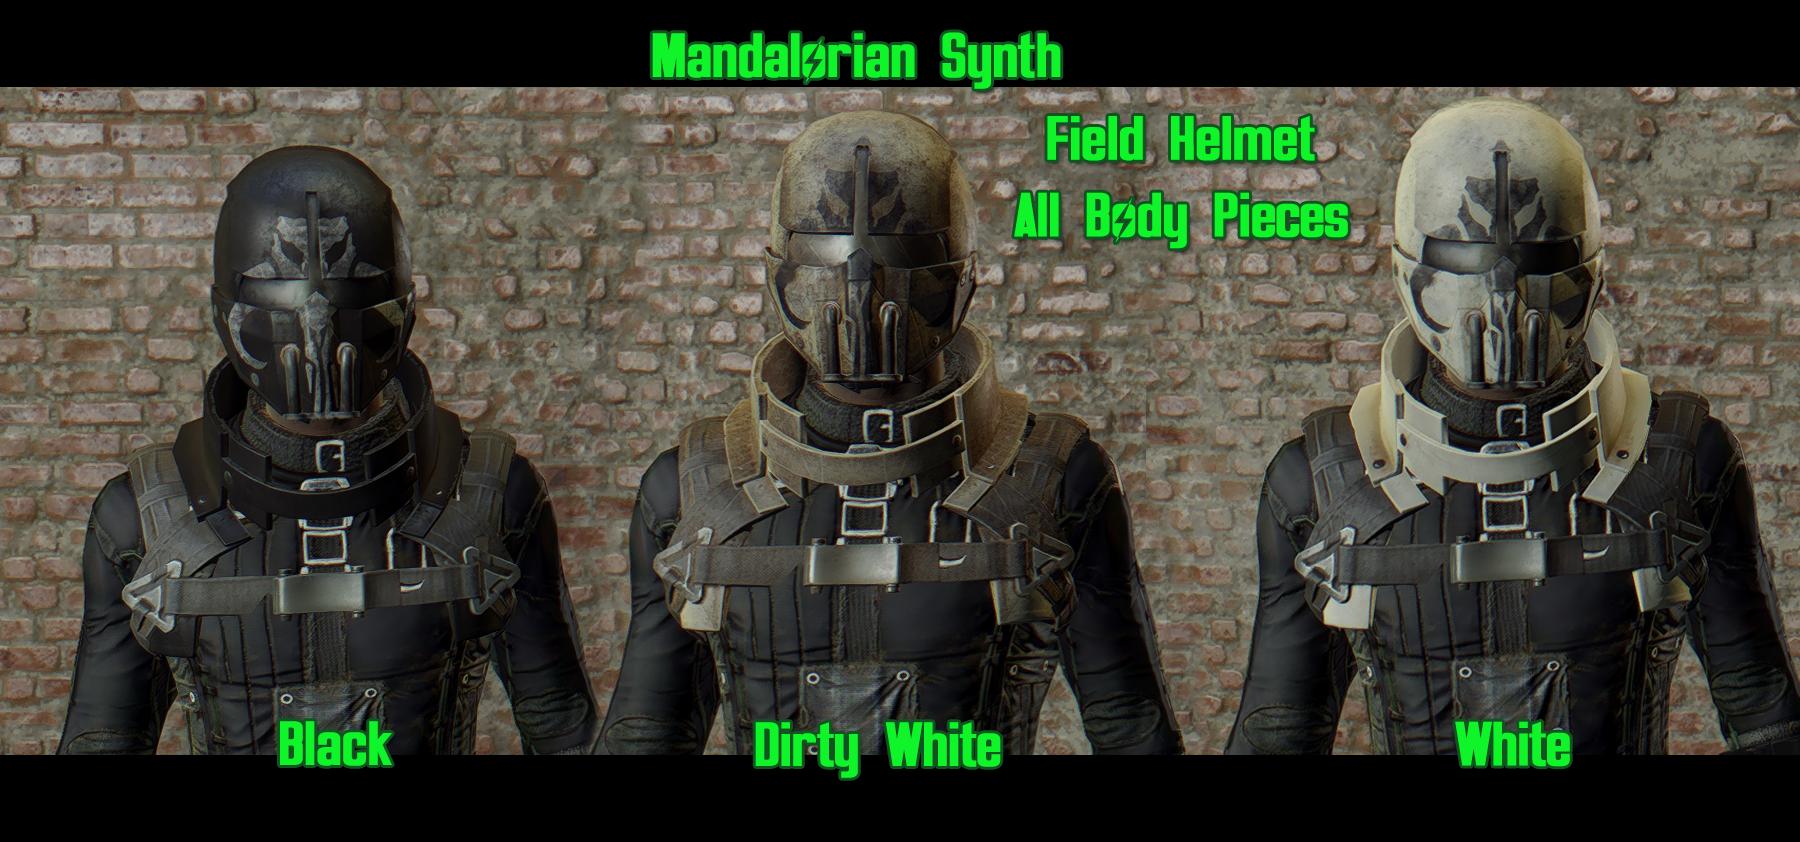 Mandalorian Synth at Fallout 4 Nexus - Mods and community